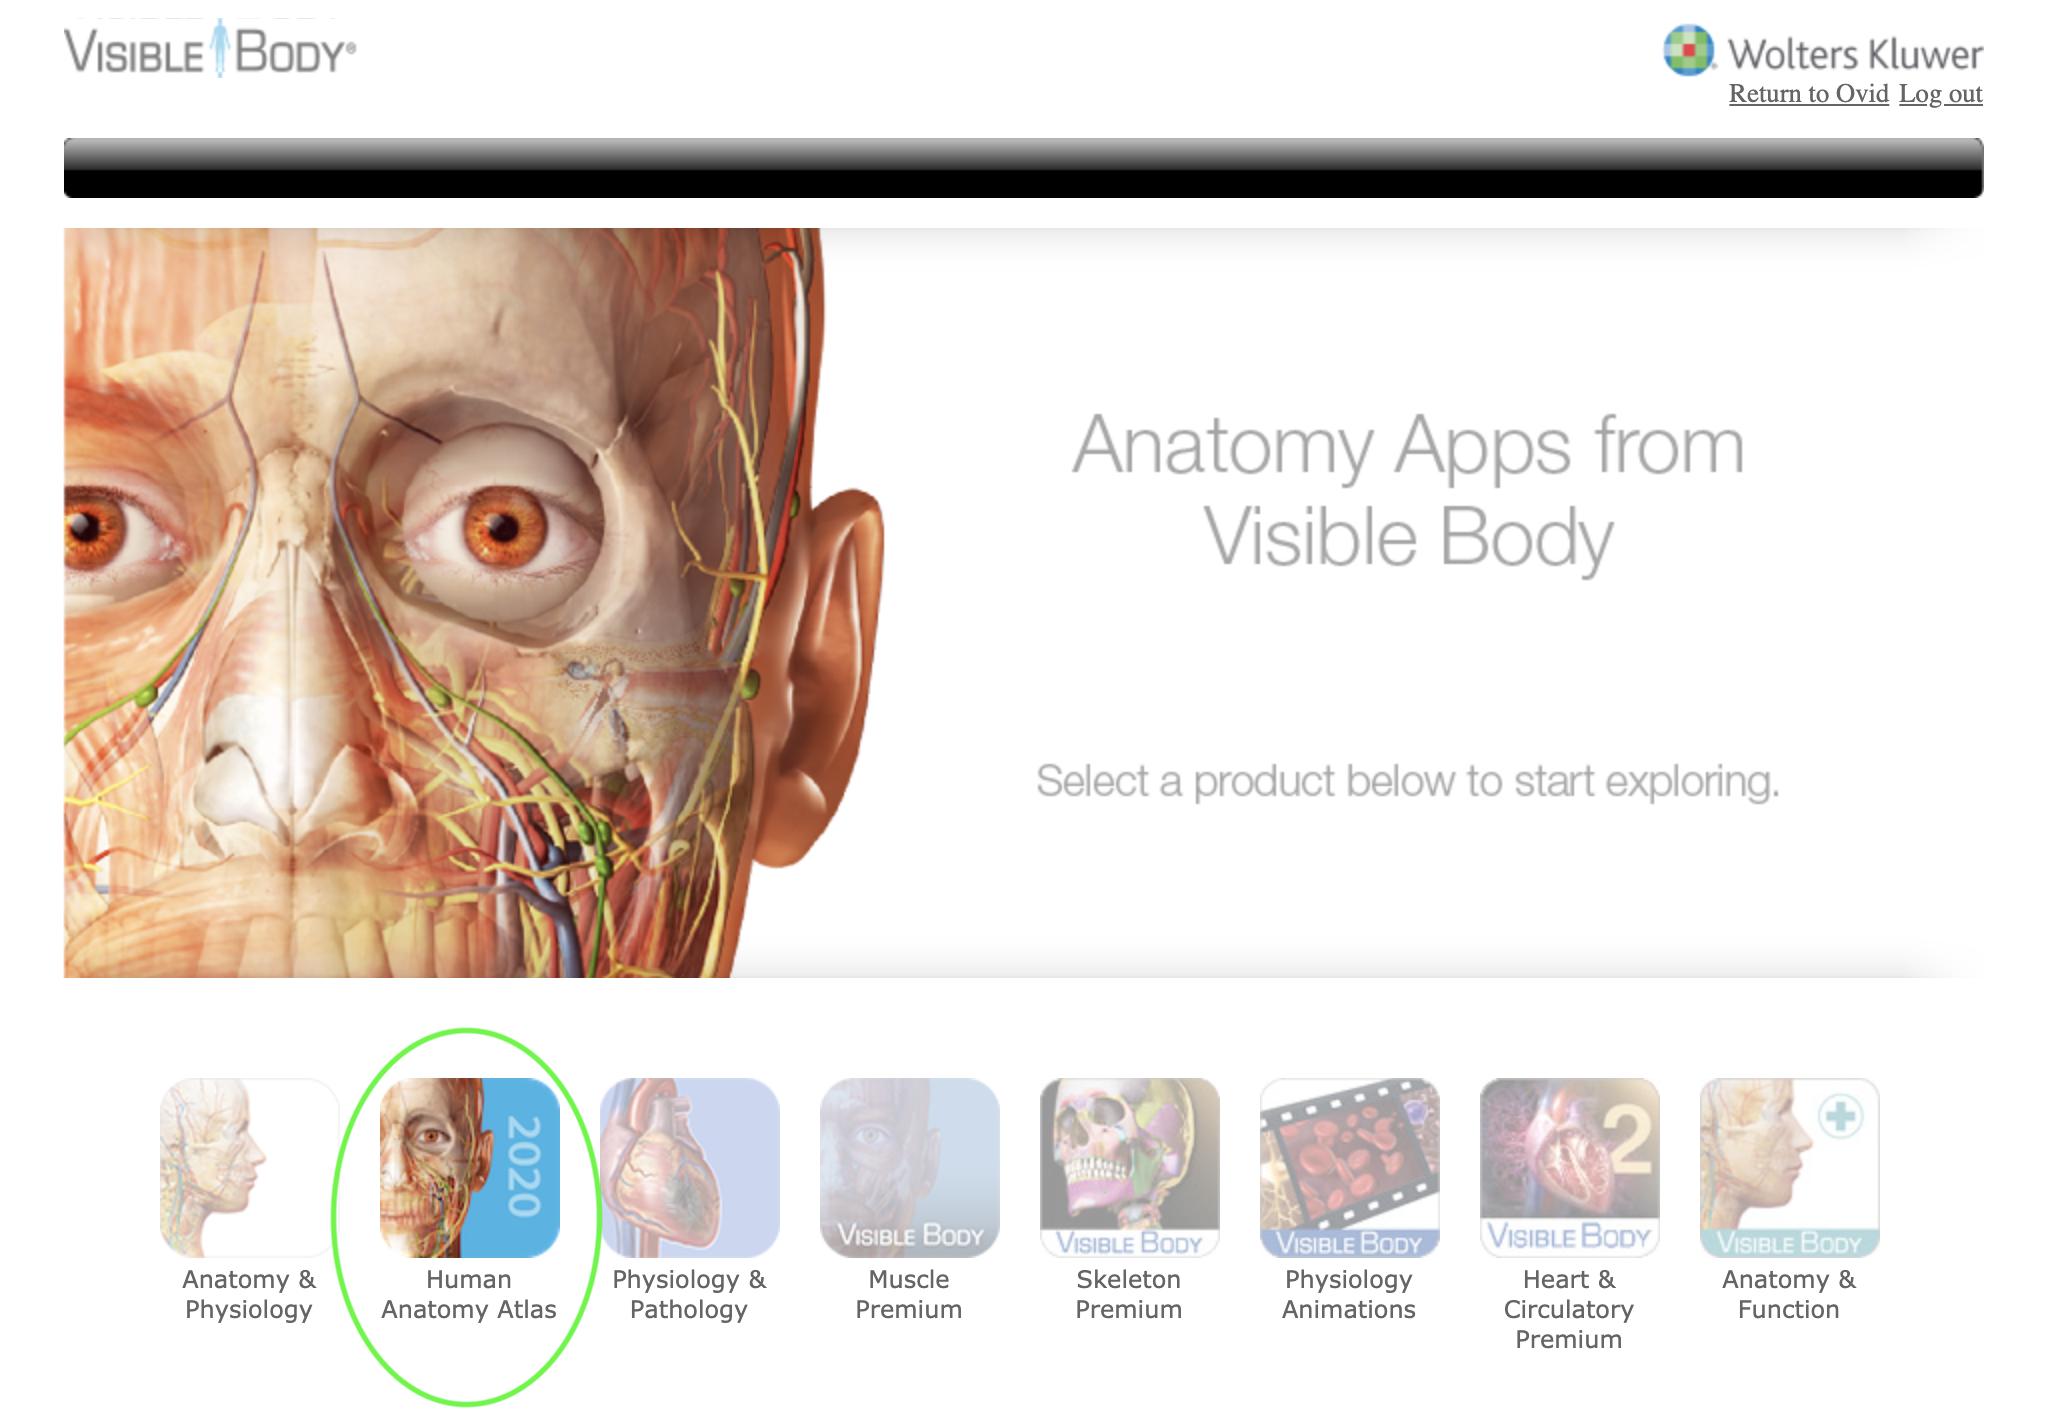 Human Anatomy Atlas app highlighted